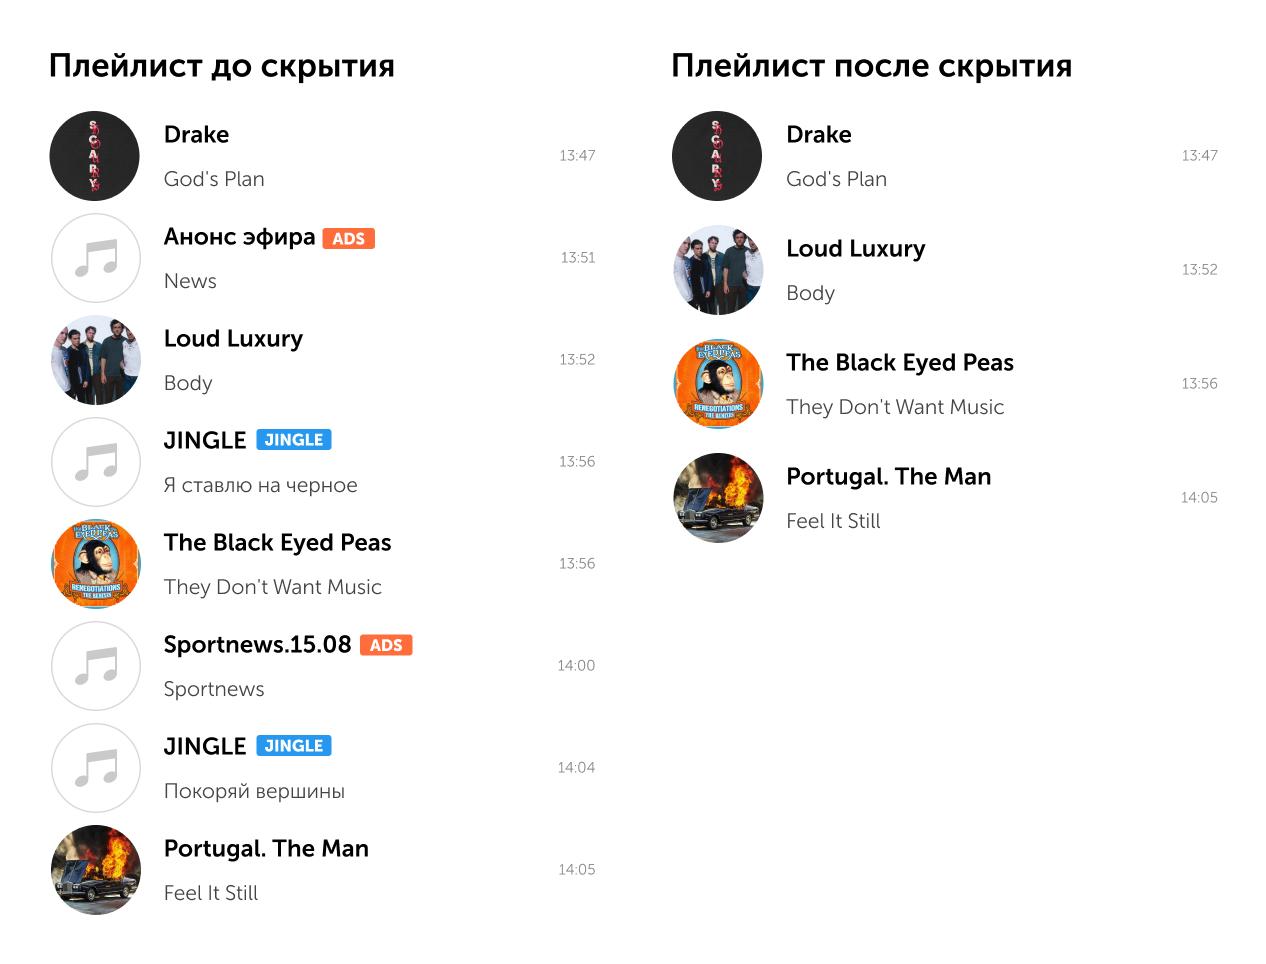 https://directus.radioheart.ru/storage/uploads/00000000066.jpg